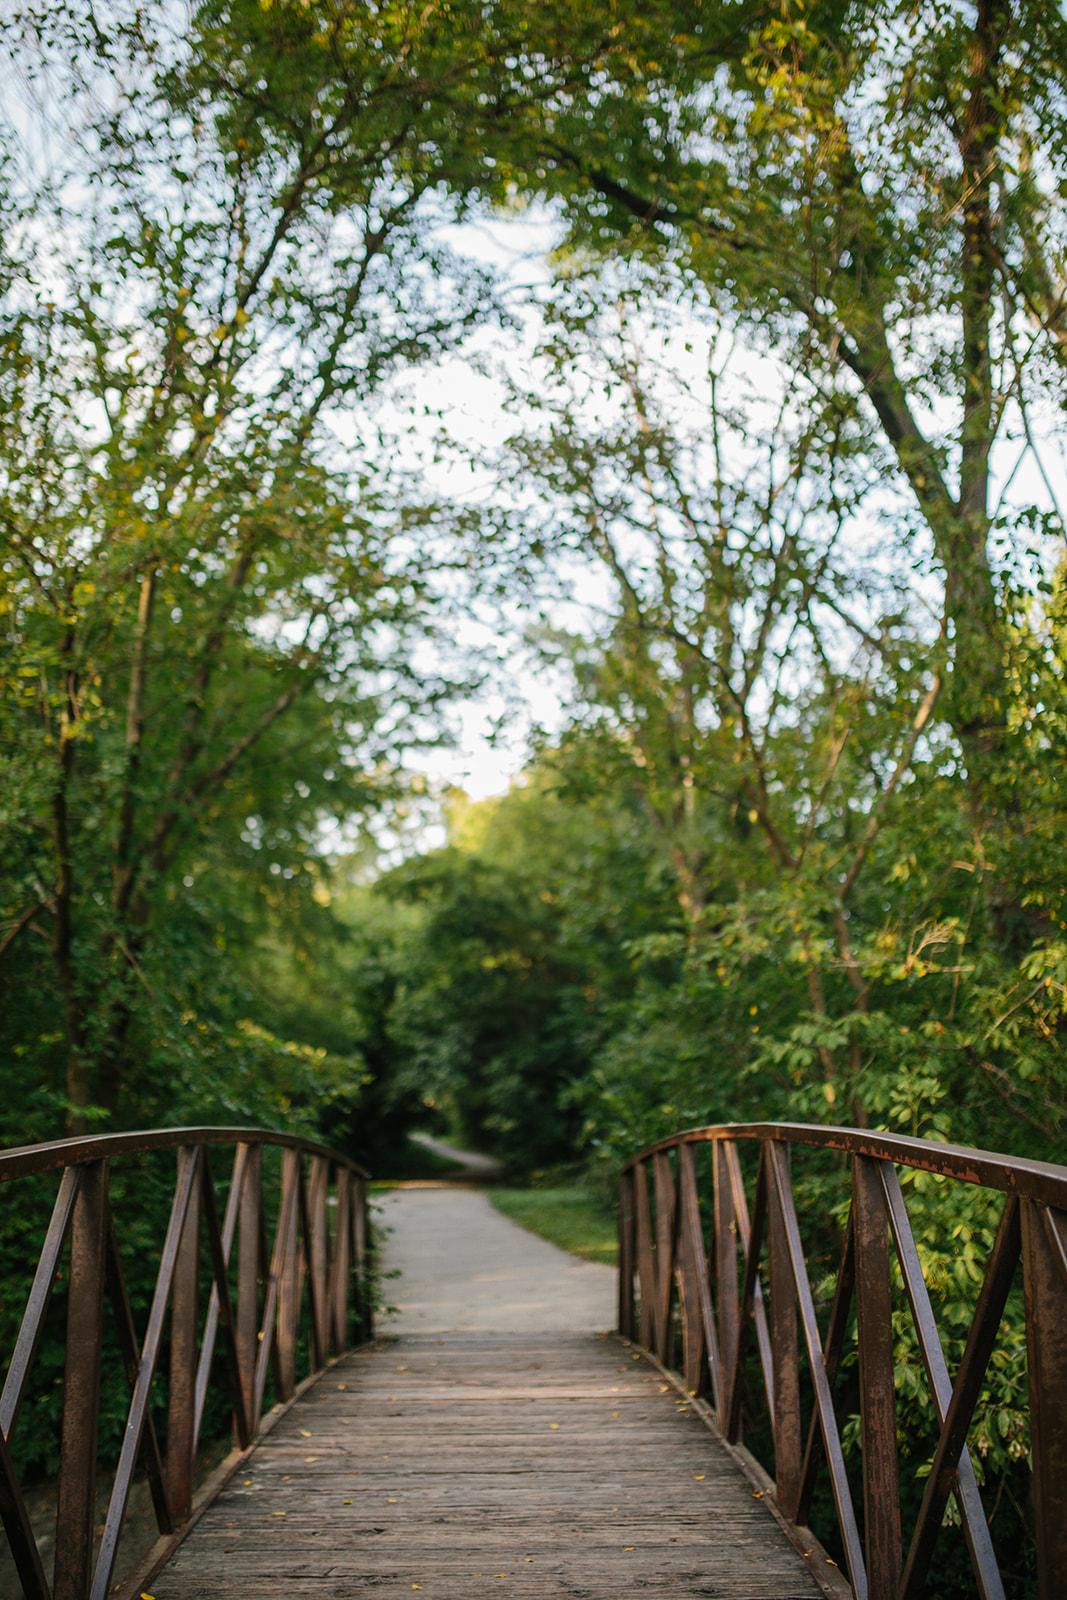 greenwood-048.jpg